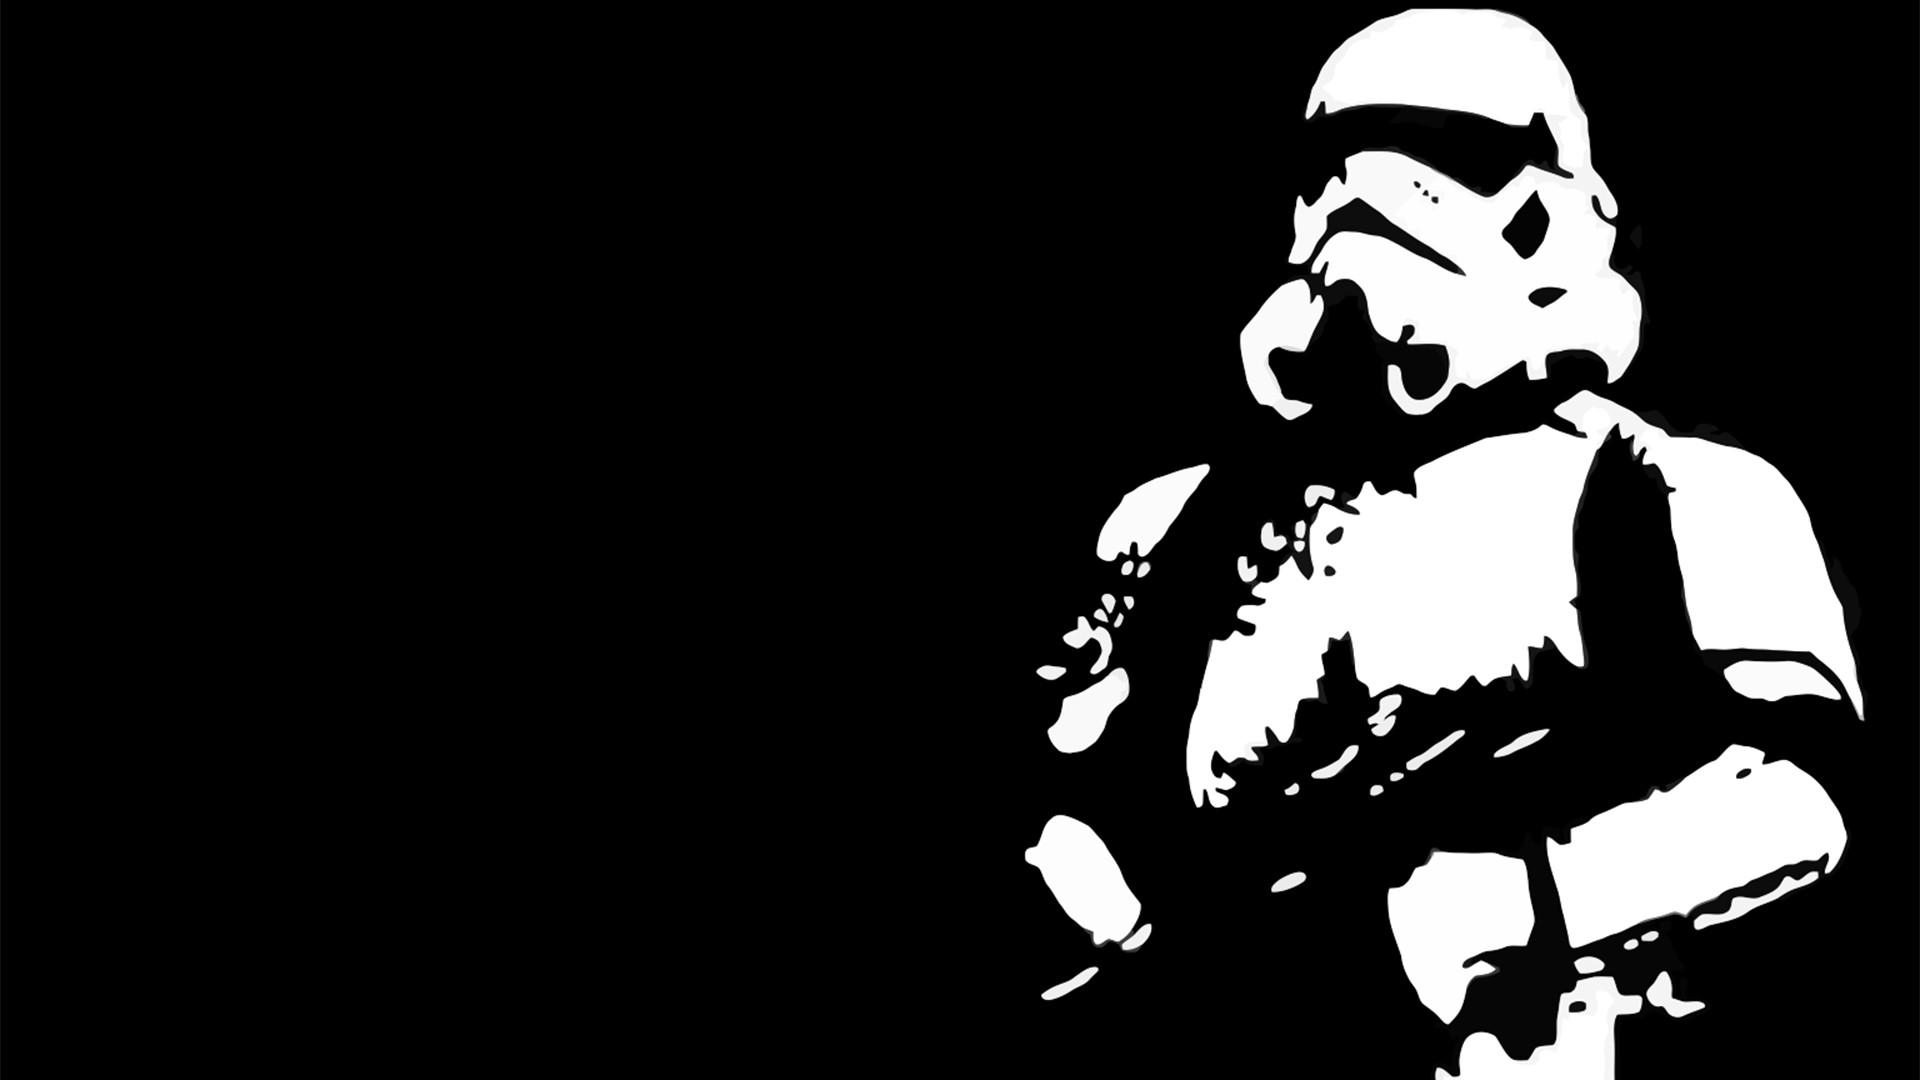 star wars logo wallpaper 67 images